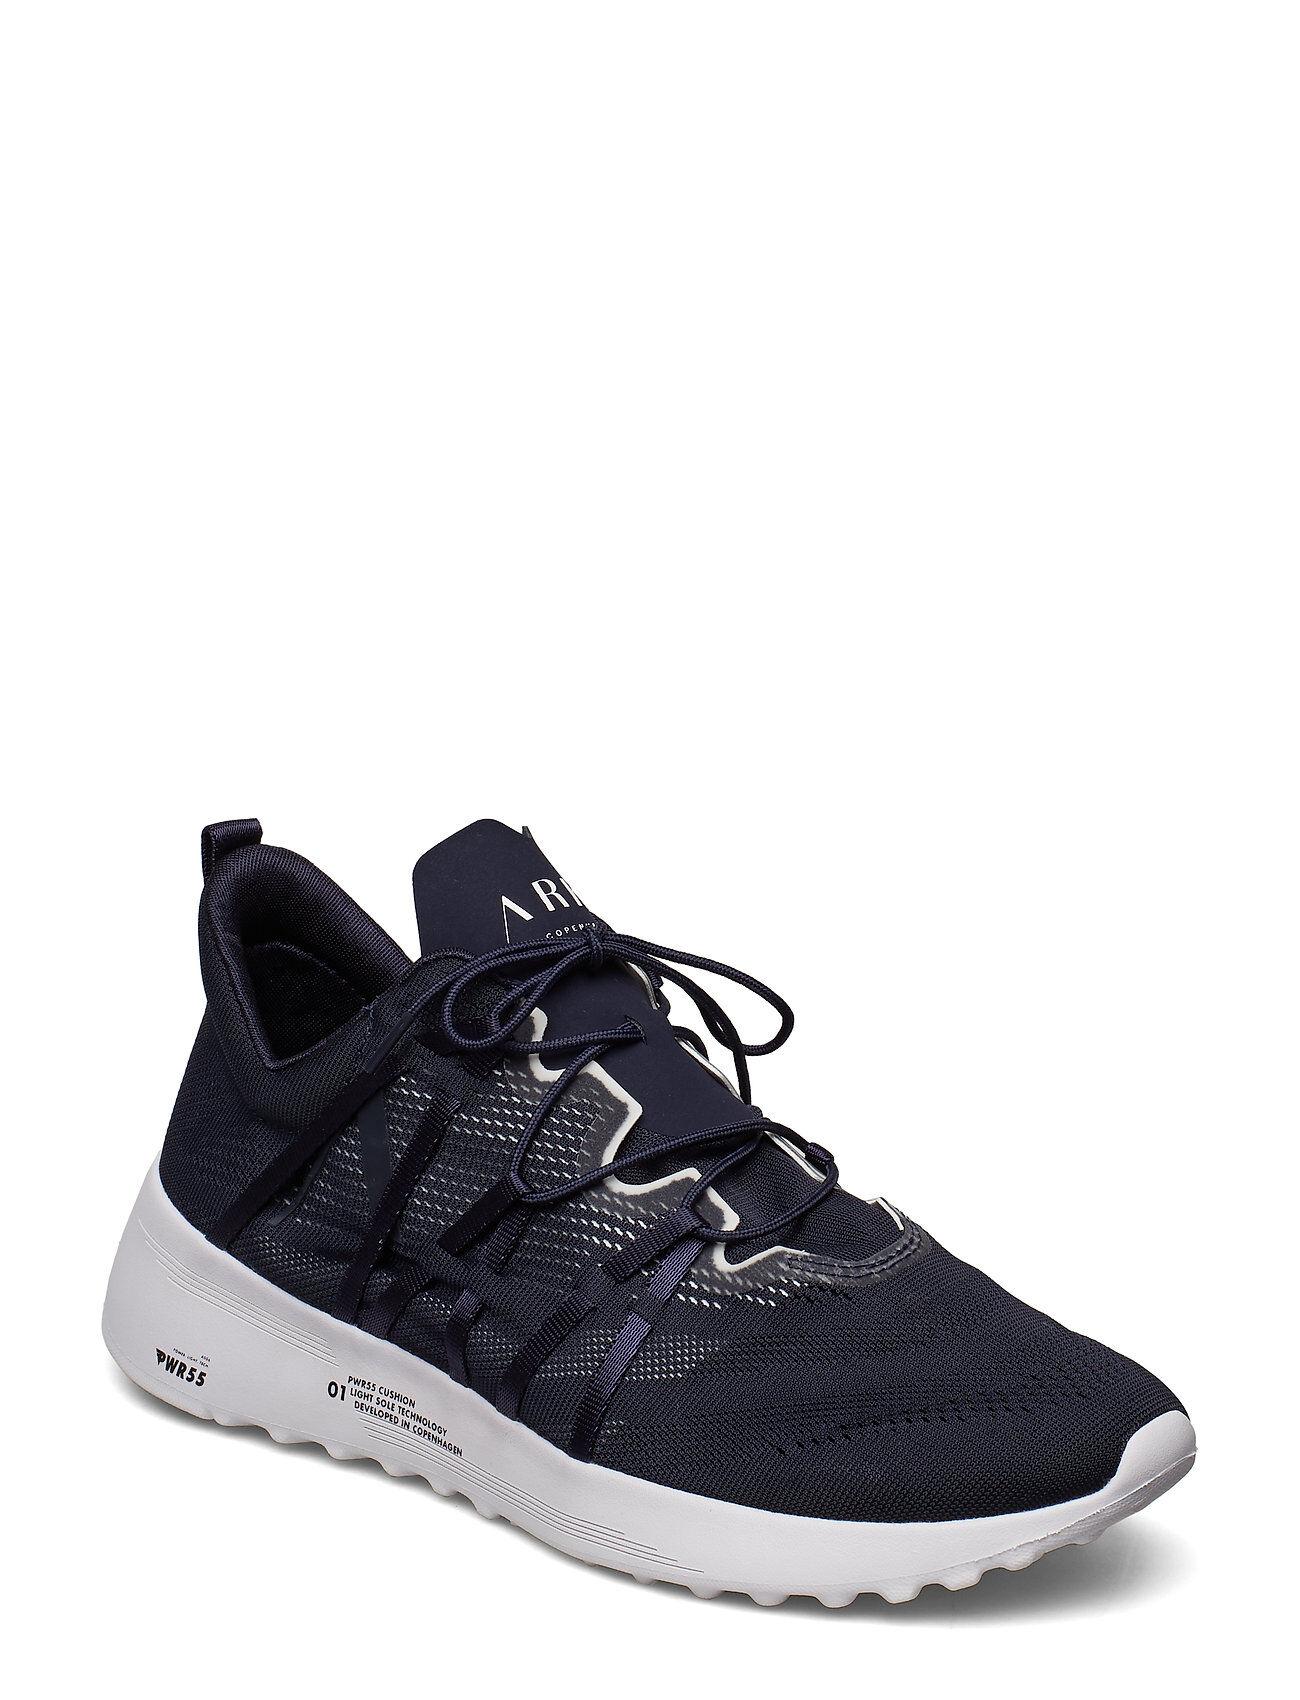 ARKK Copenhagen Velcalite Cm Pwr55 Midnight White - Matalavartiset Sneakerit Tennarit Musta ARKK Copenhagen